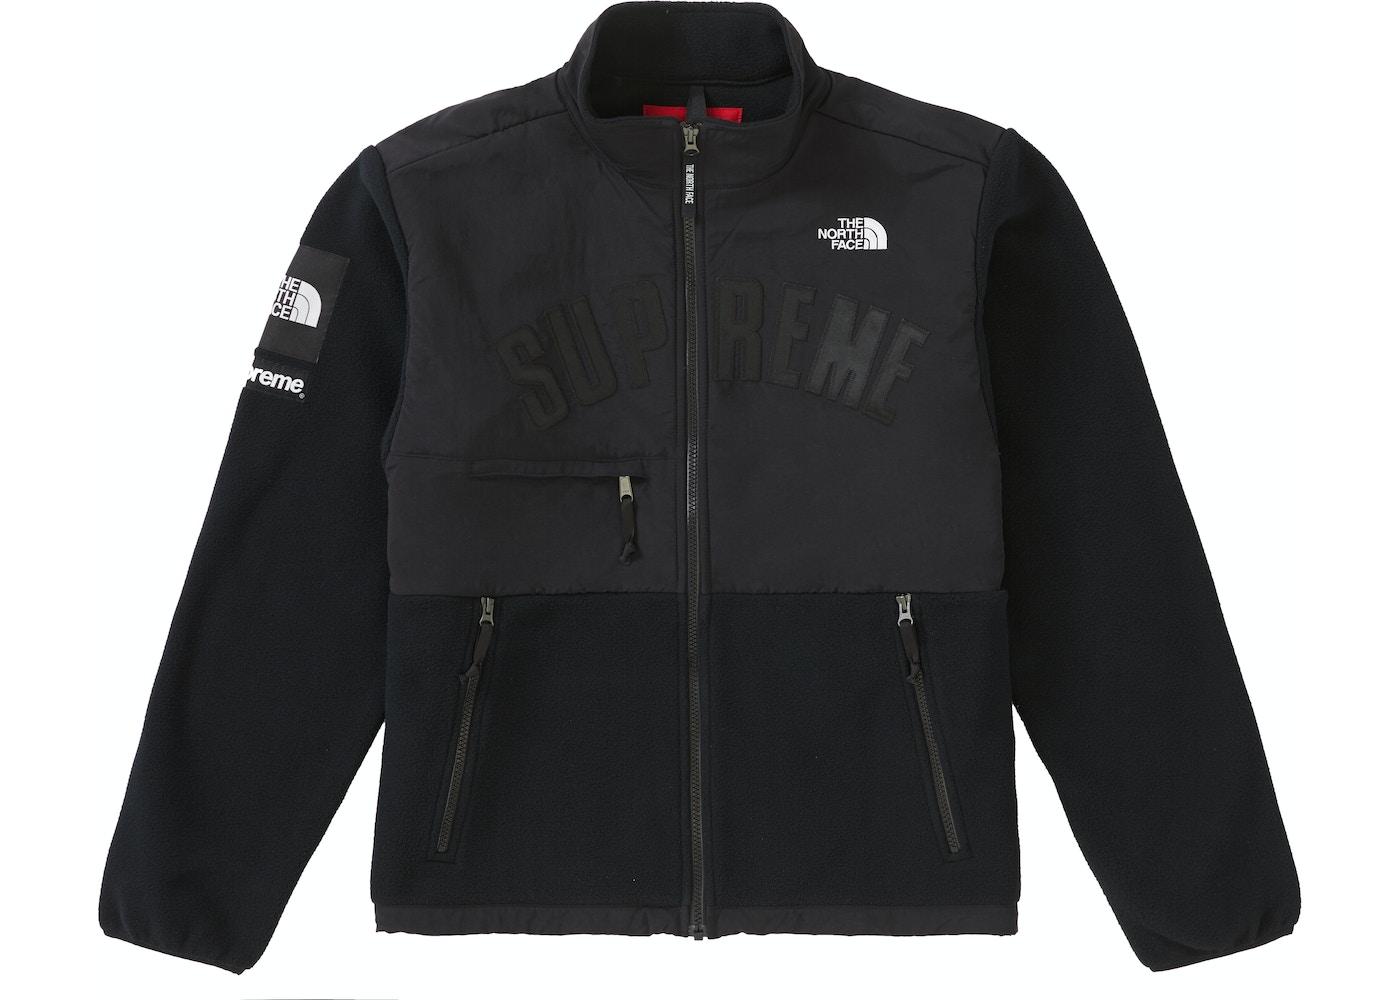 4d9b3566e Buy & Sell Streetwear - Supreme, Bape, Palace, Kith